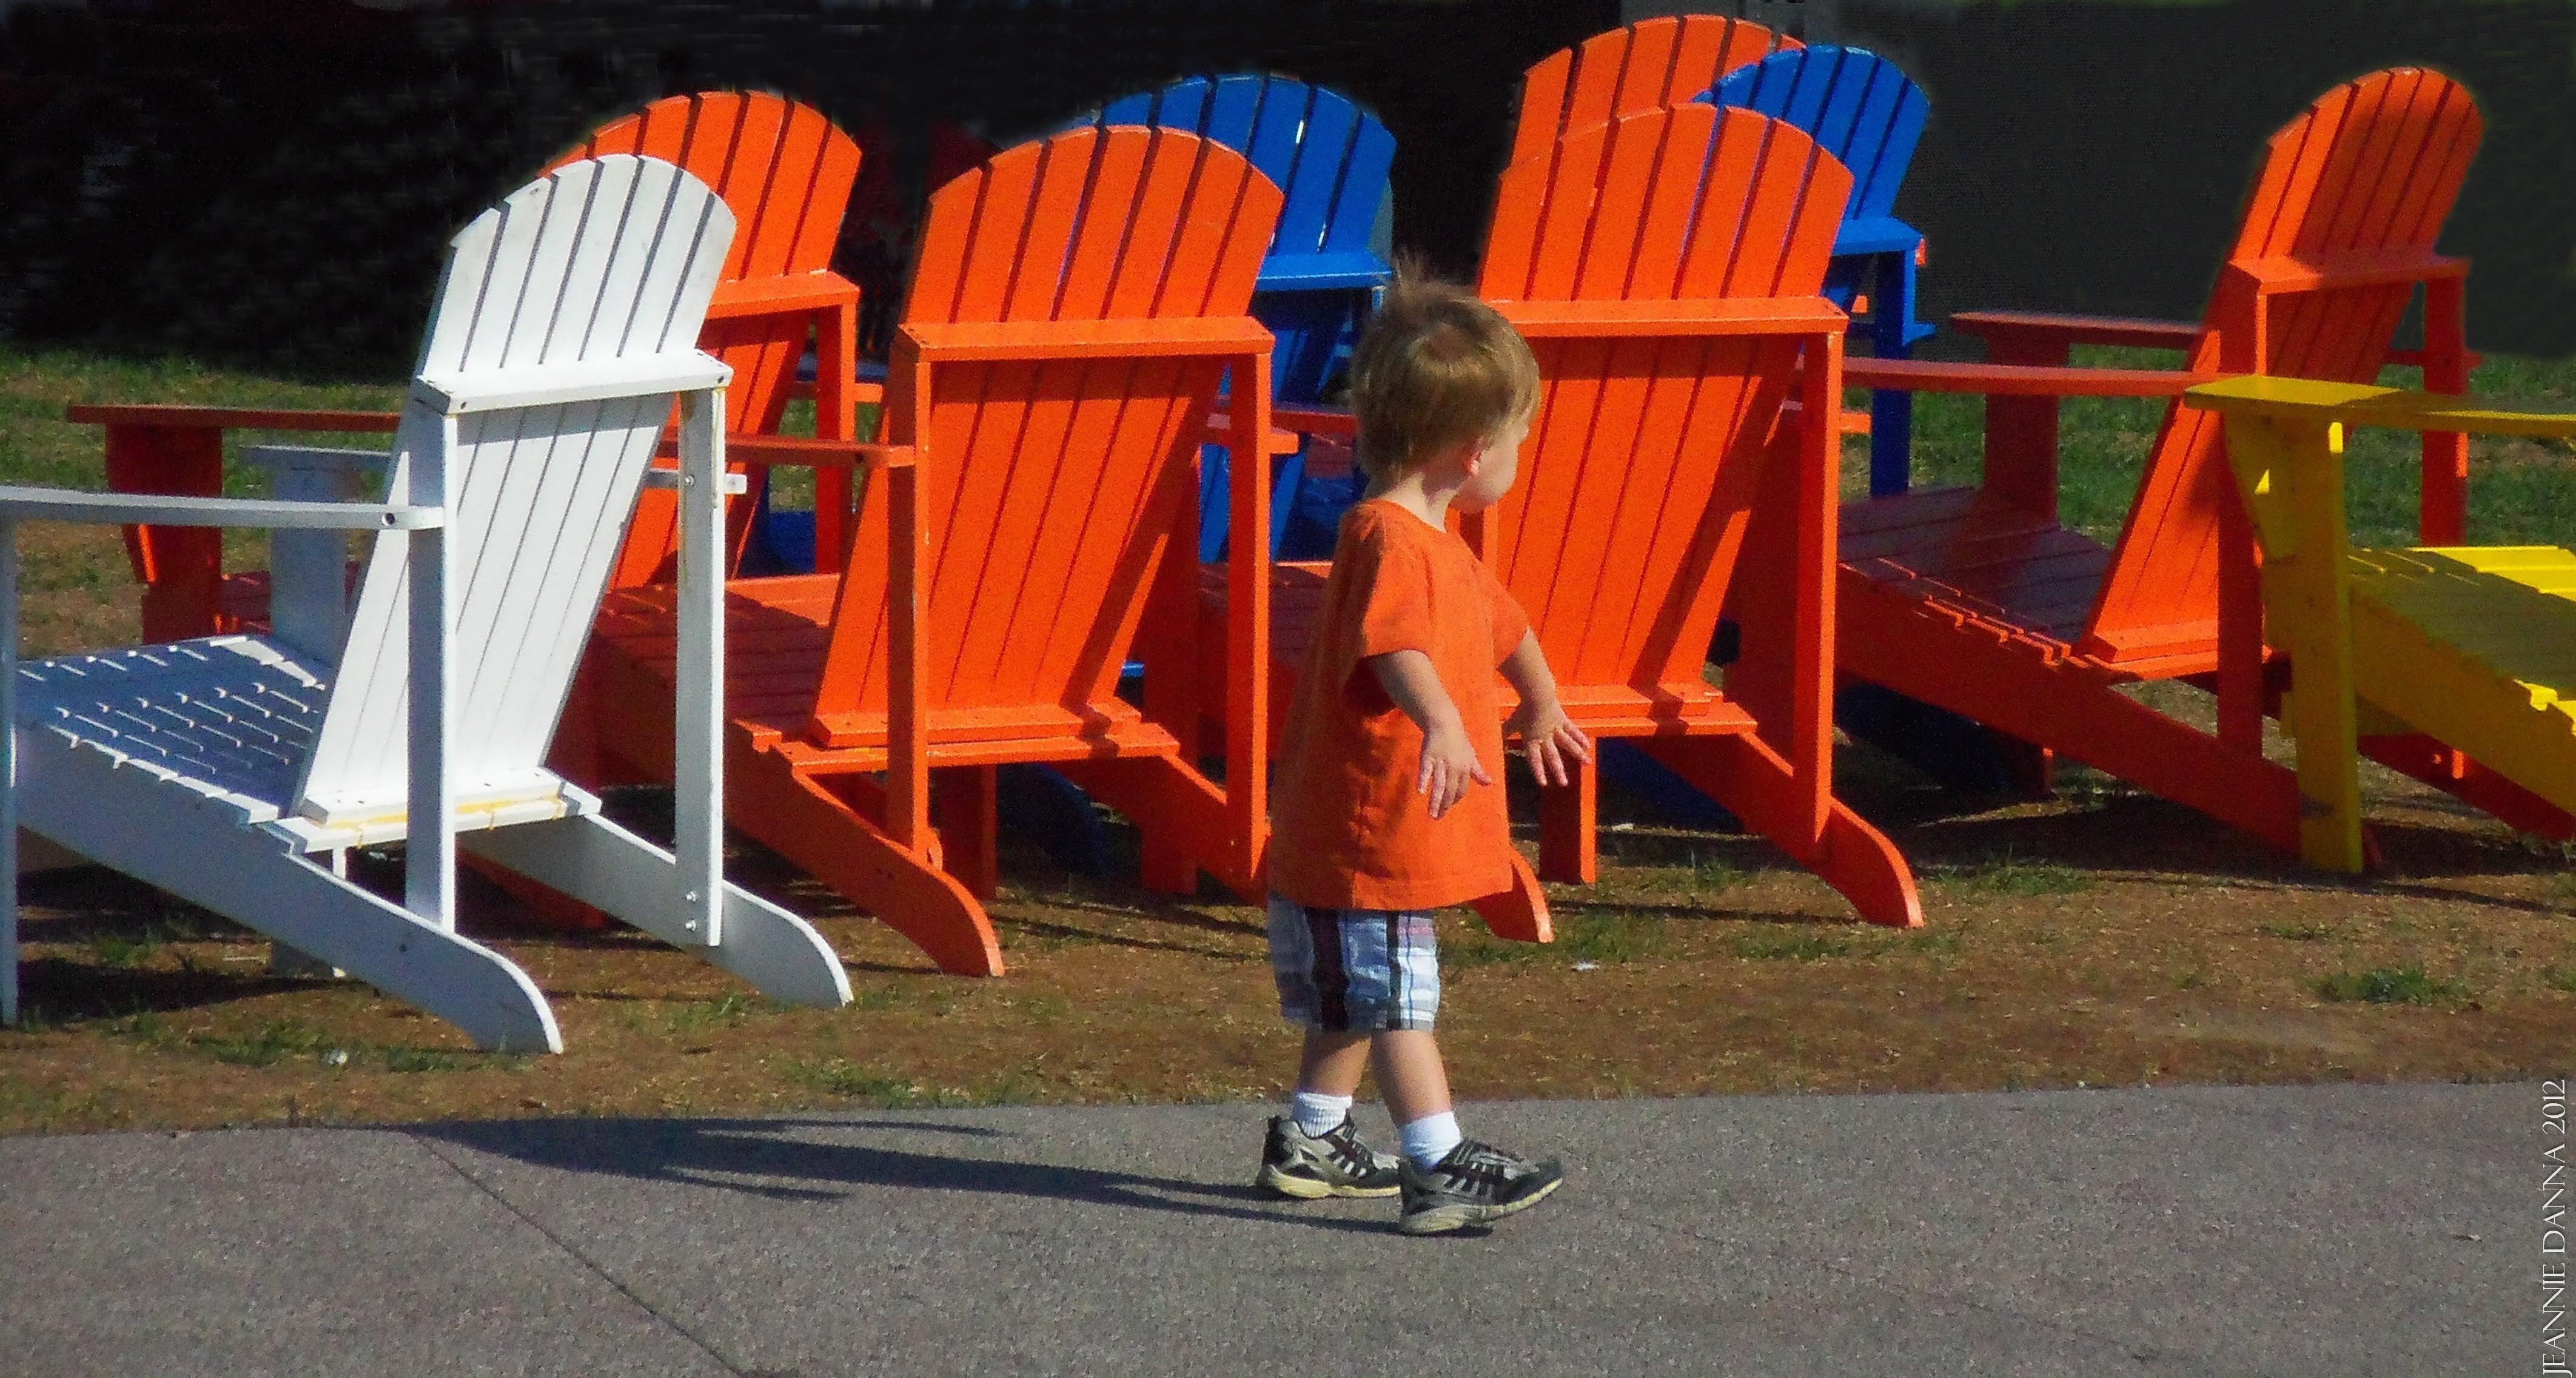 Boy & Chairs